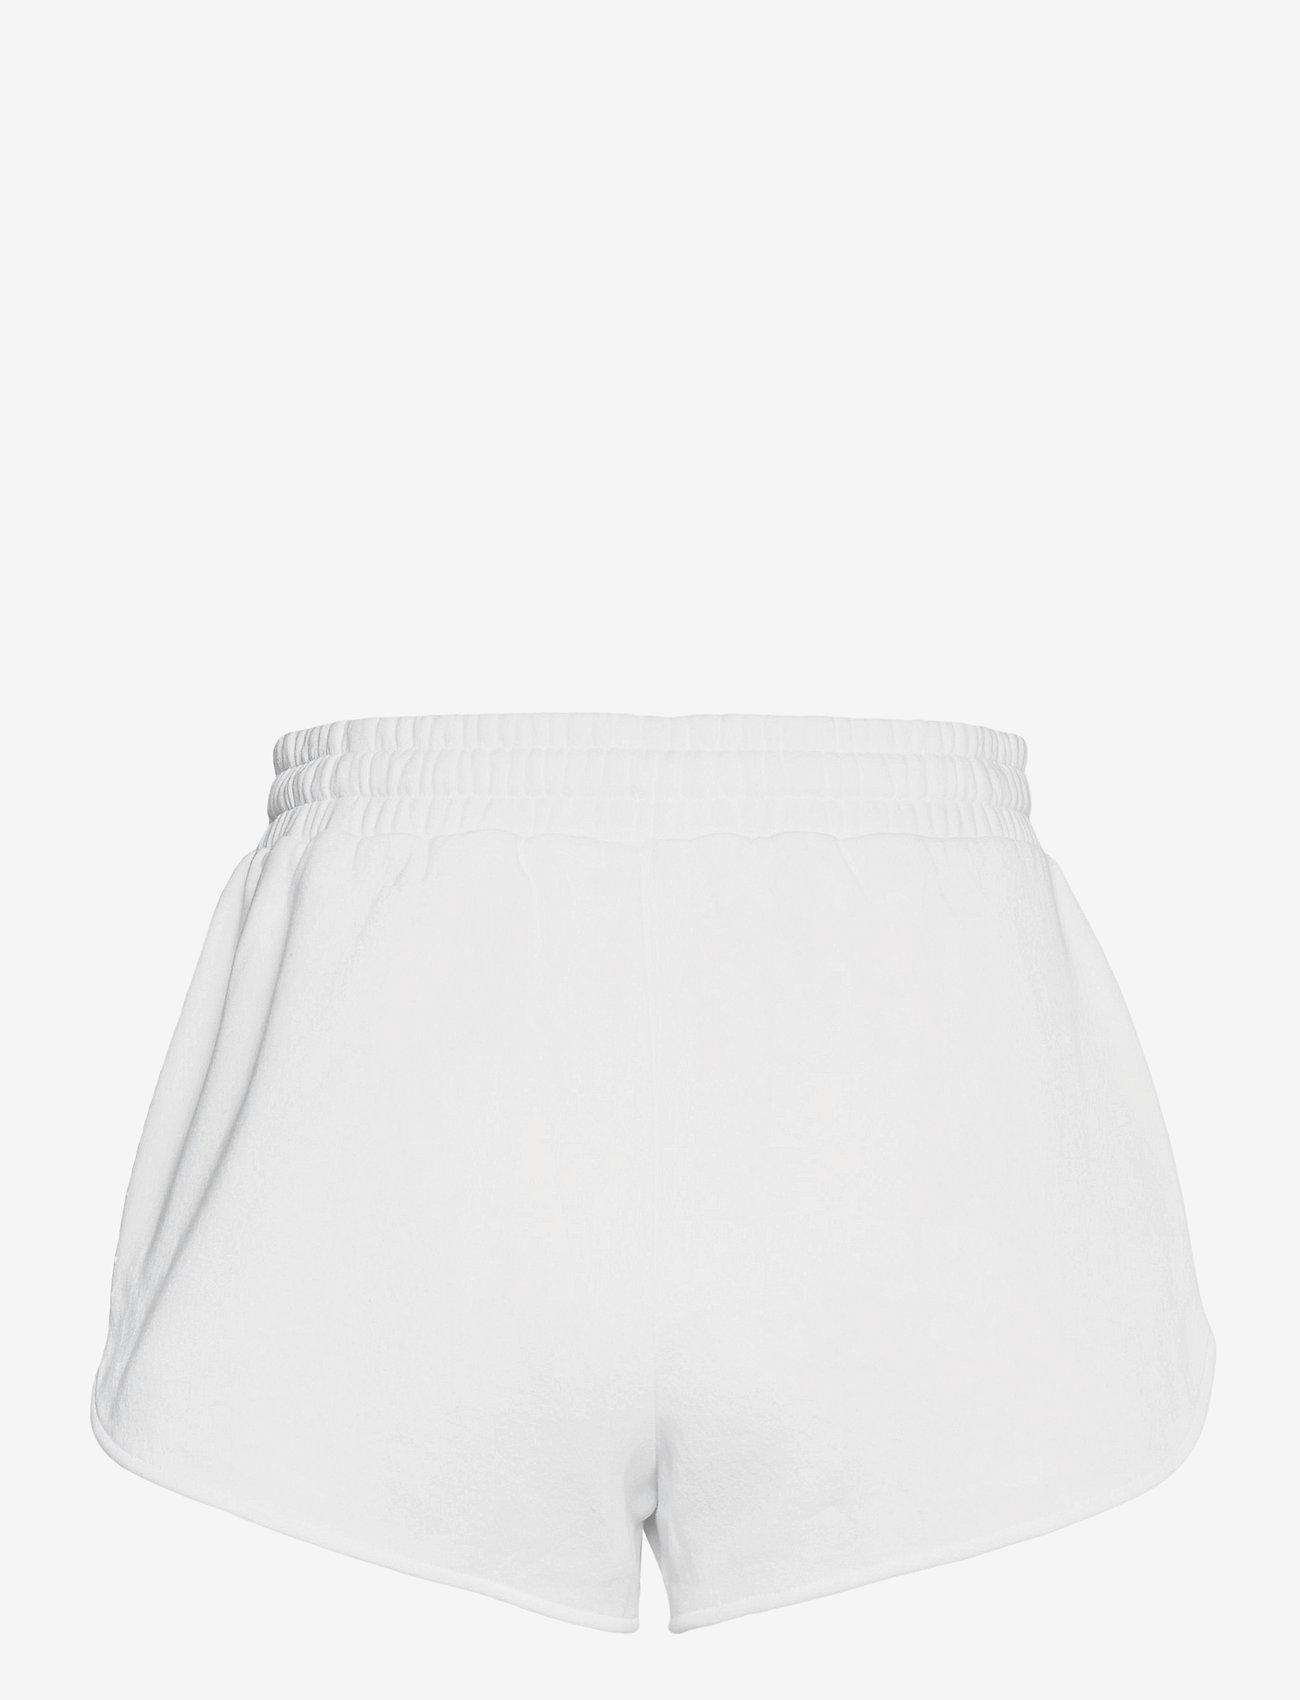 Michael Kors - CLASSIC SPORT SHORT - casual shorts - white - 1